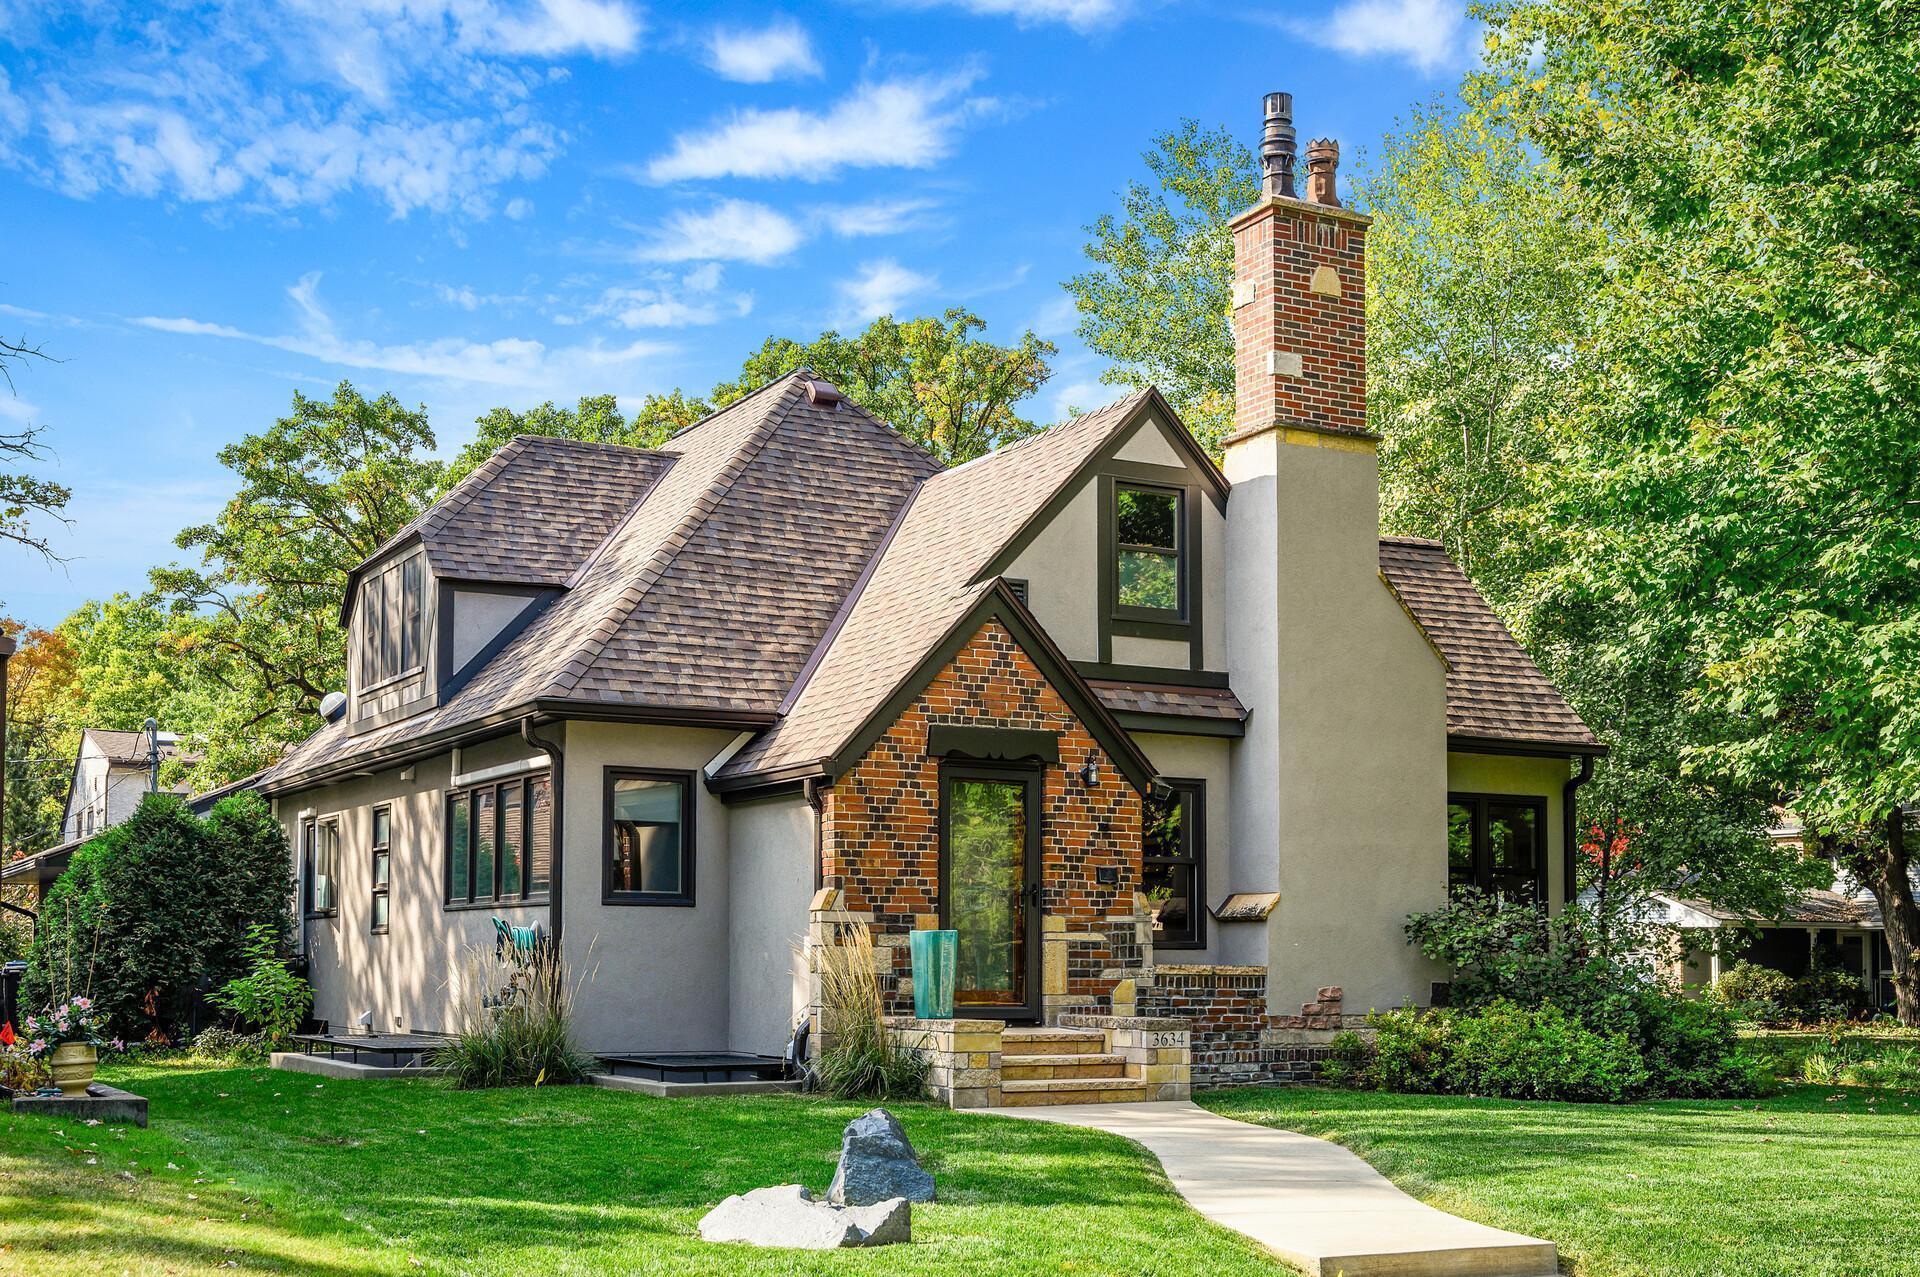 3634 47th Avenue S Property Photo - Minneapolis, MN real estate listing